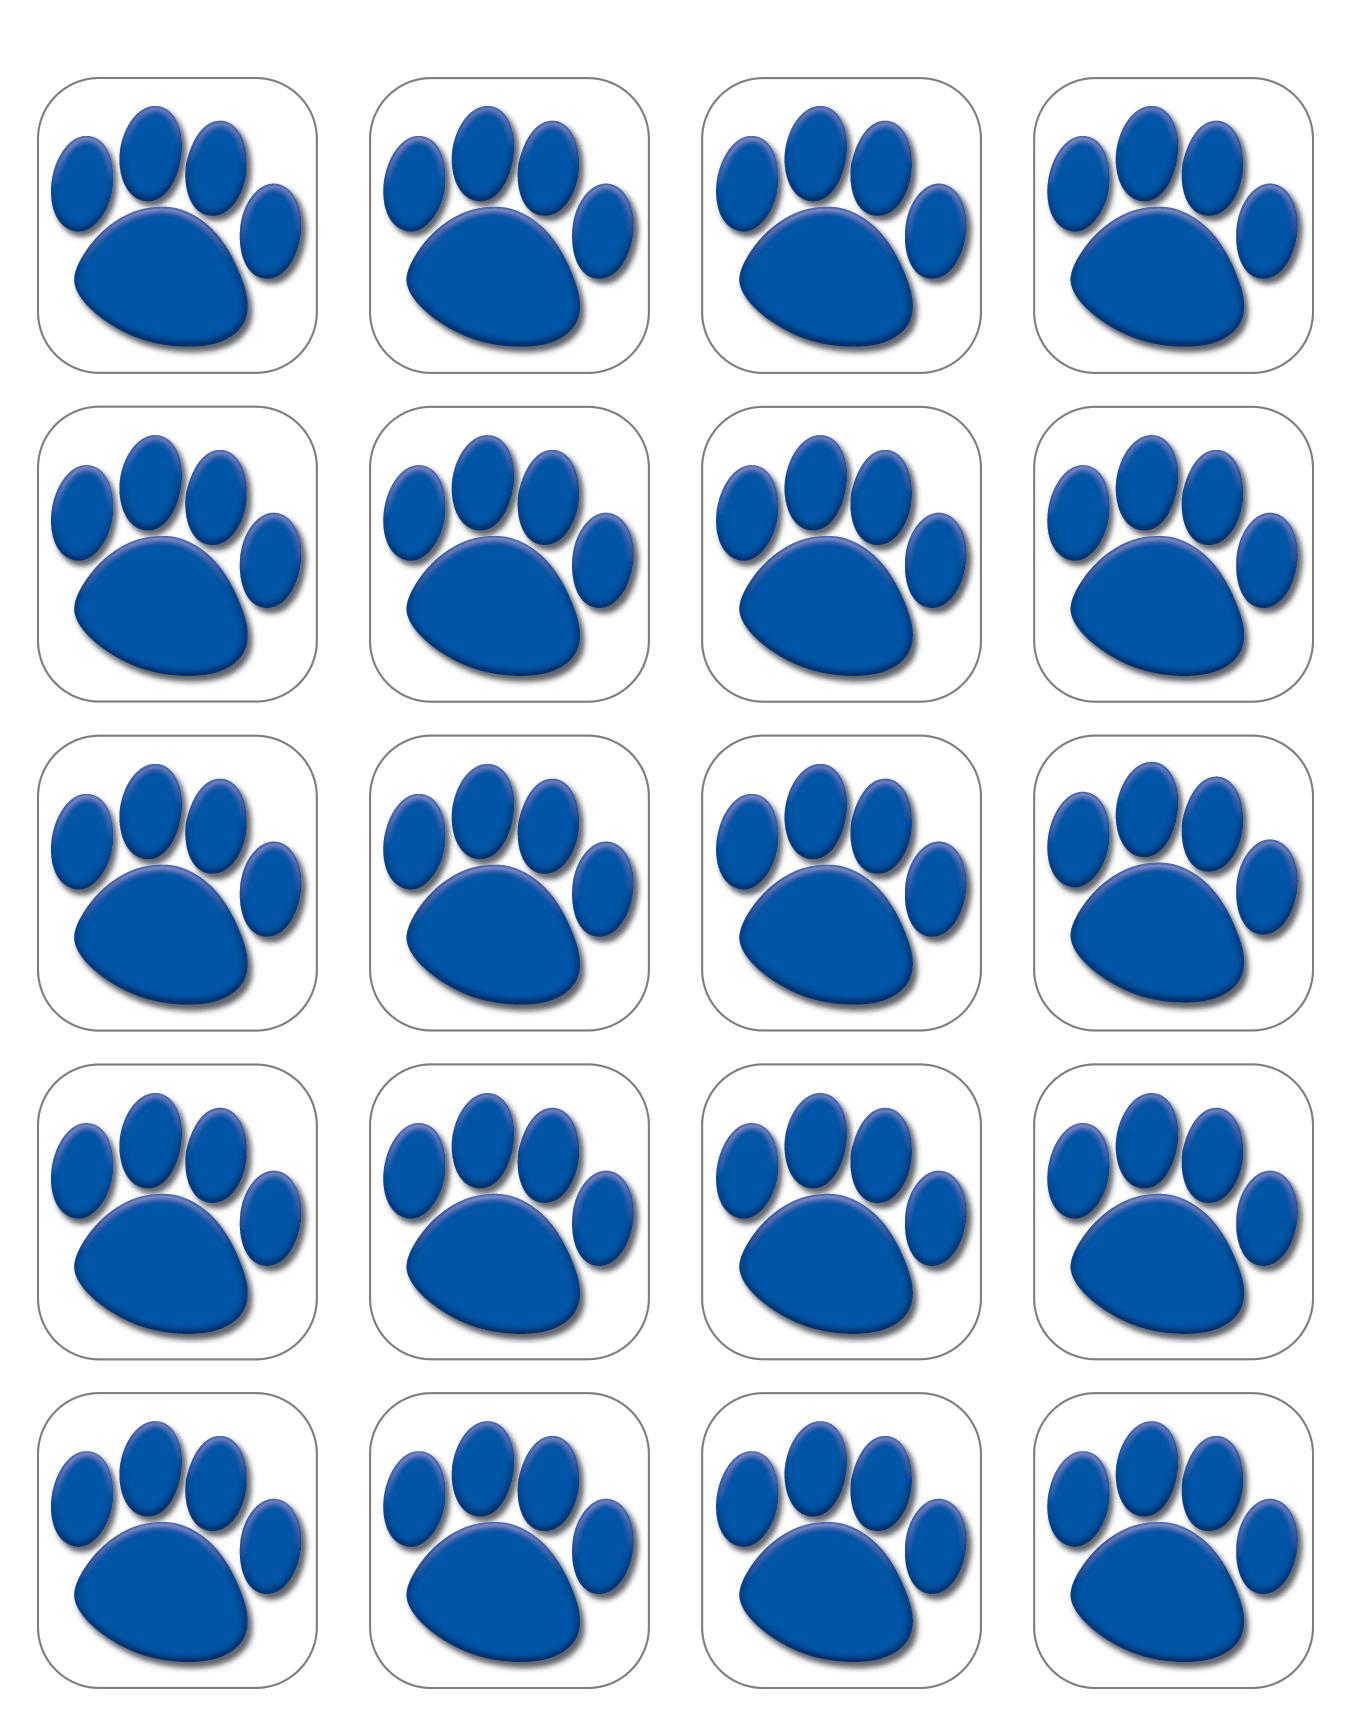 Blue Paw Prints Stickers